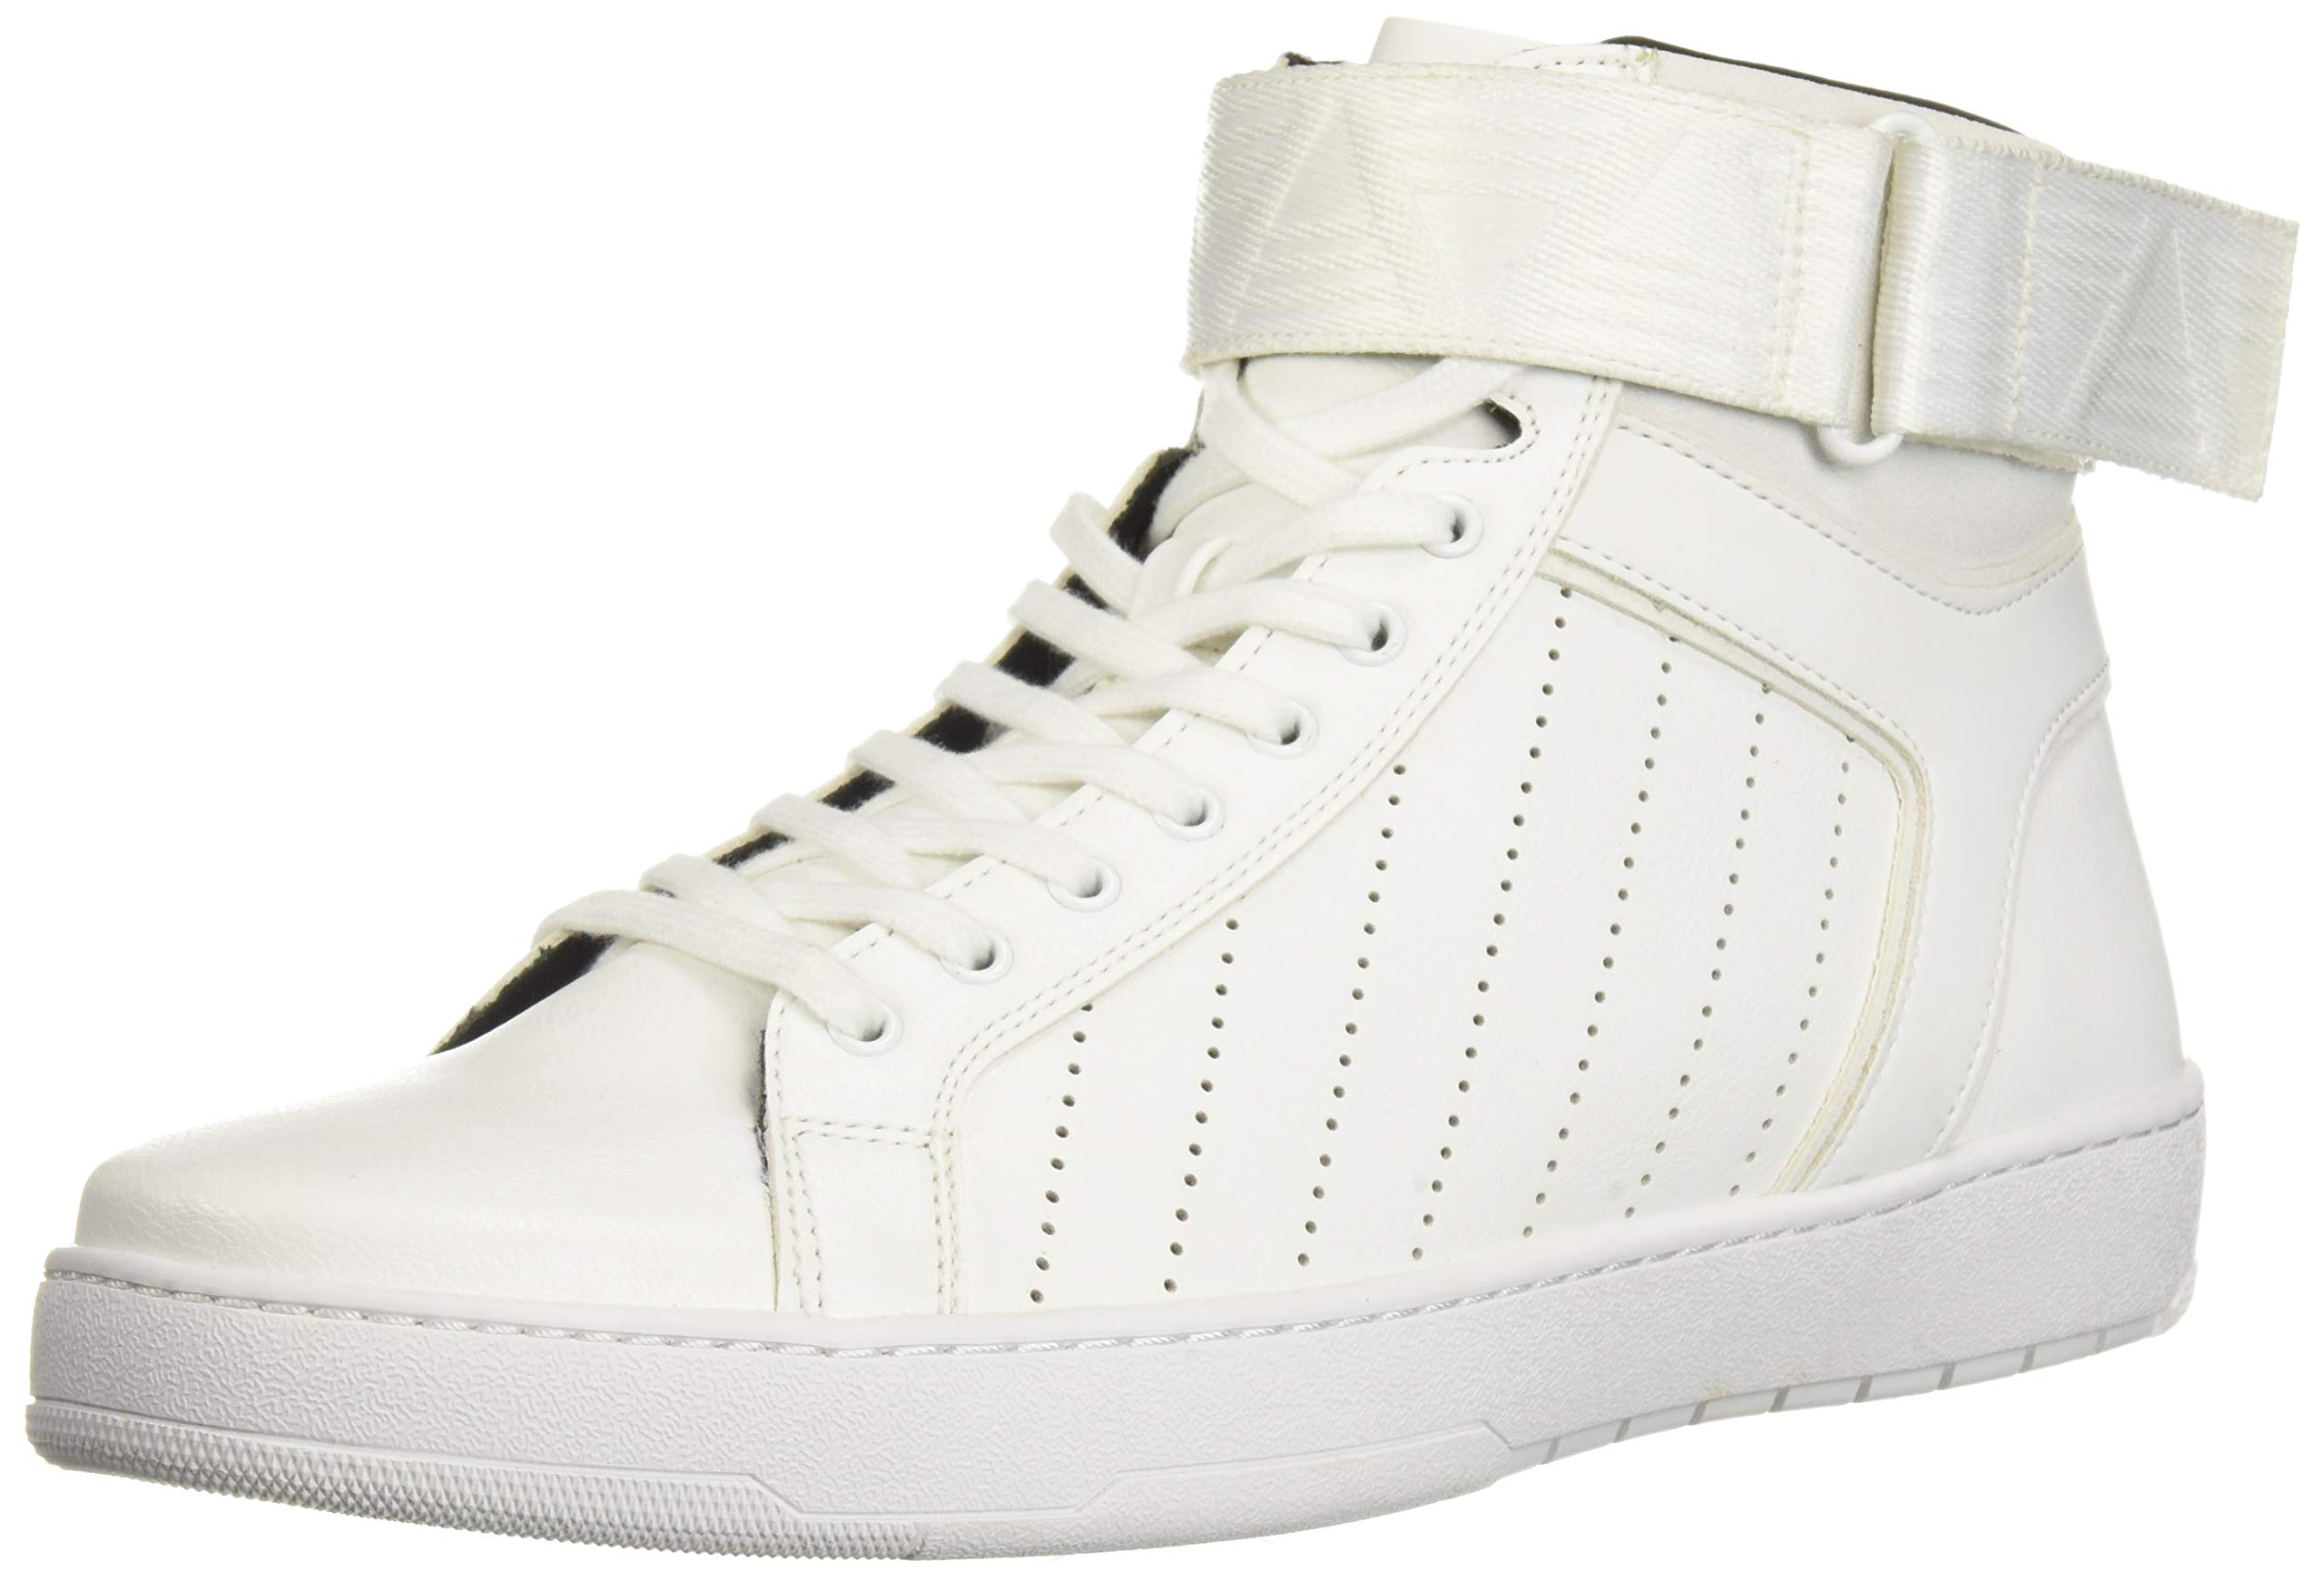 ویکالا · خرید  اصل اورجینال · خرید از آمازون · ALDO Men's CAUDE Sneaker, White, 10 D US wekala · ویکالا